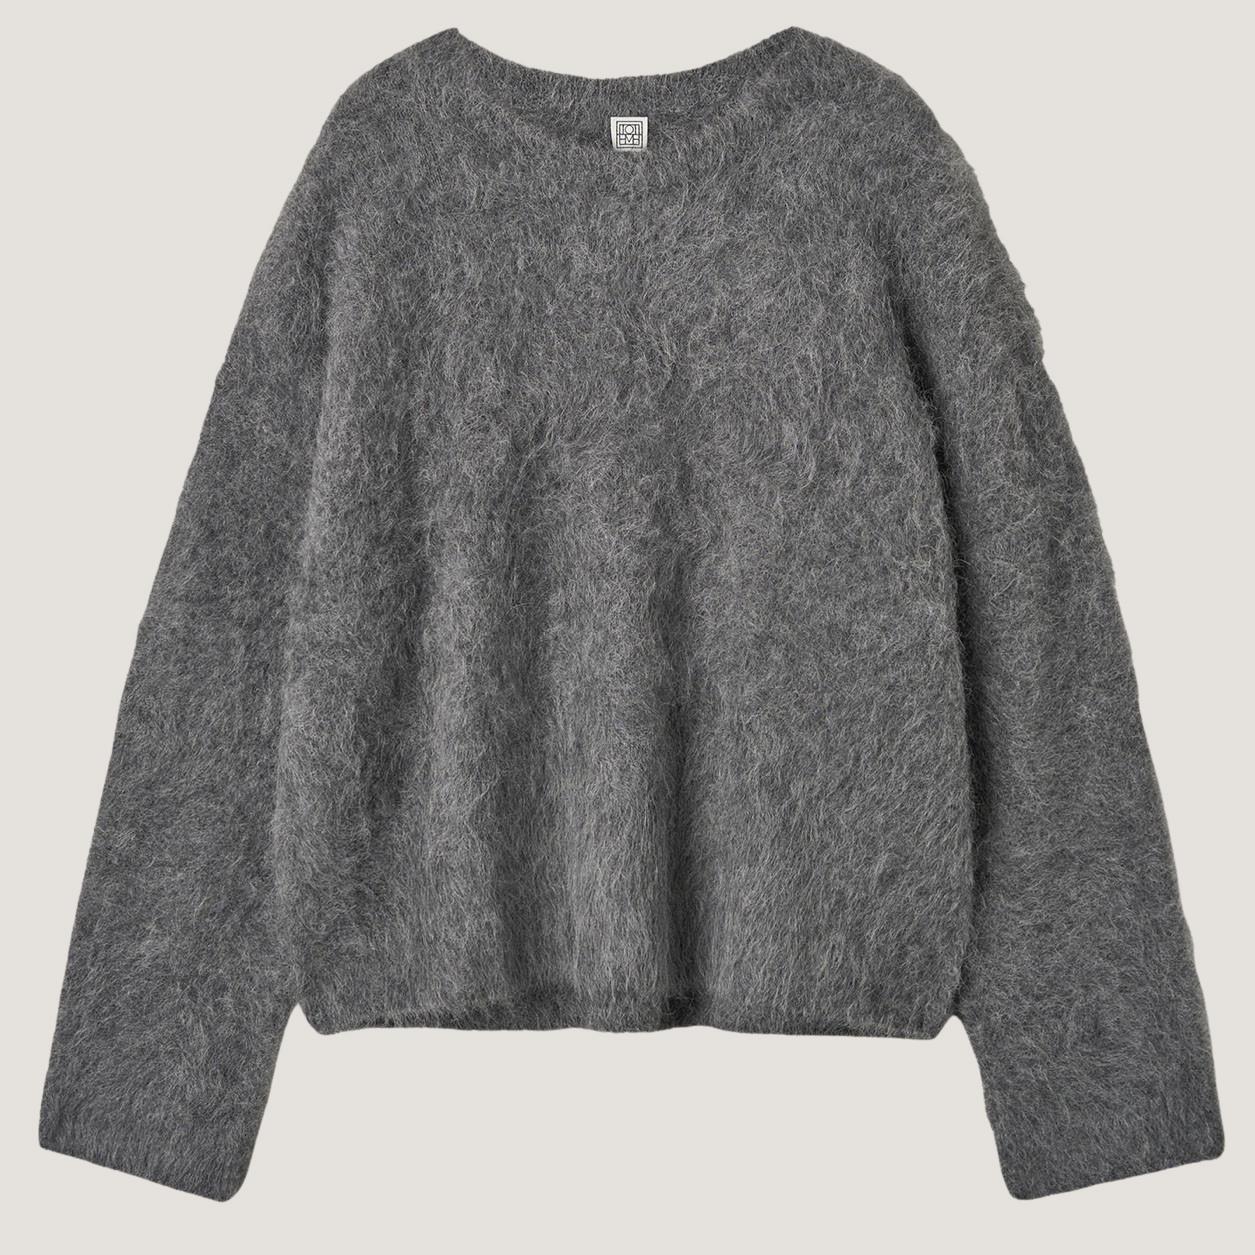 Boxy Alpaca Knit